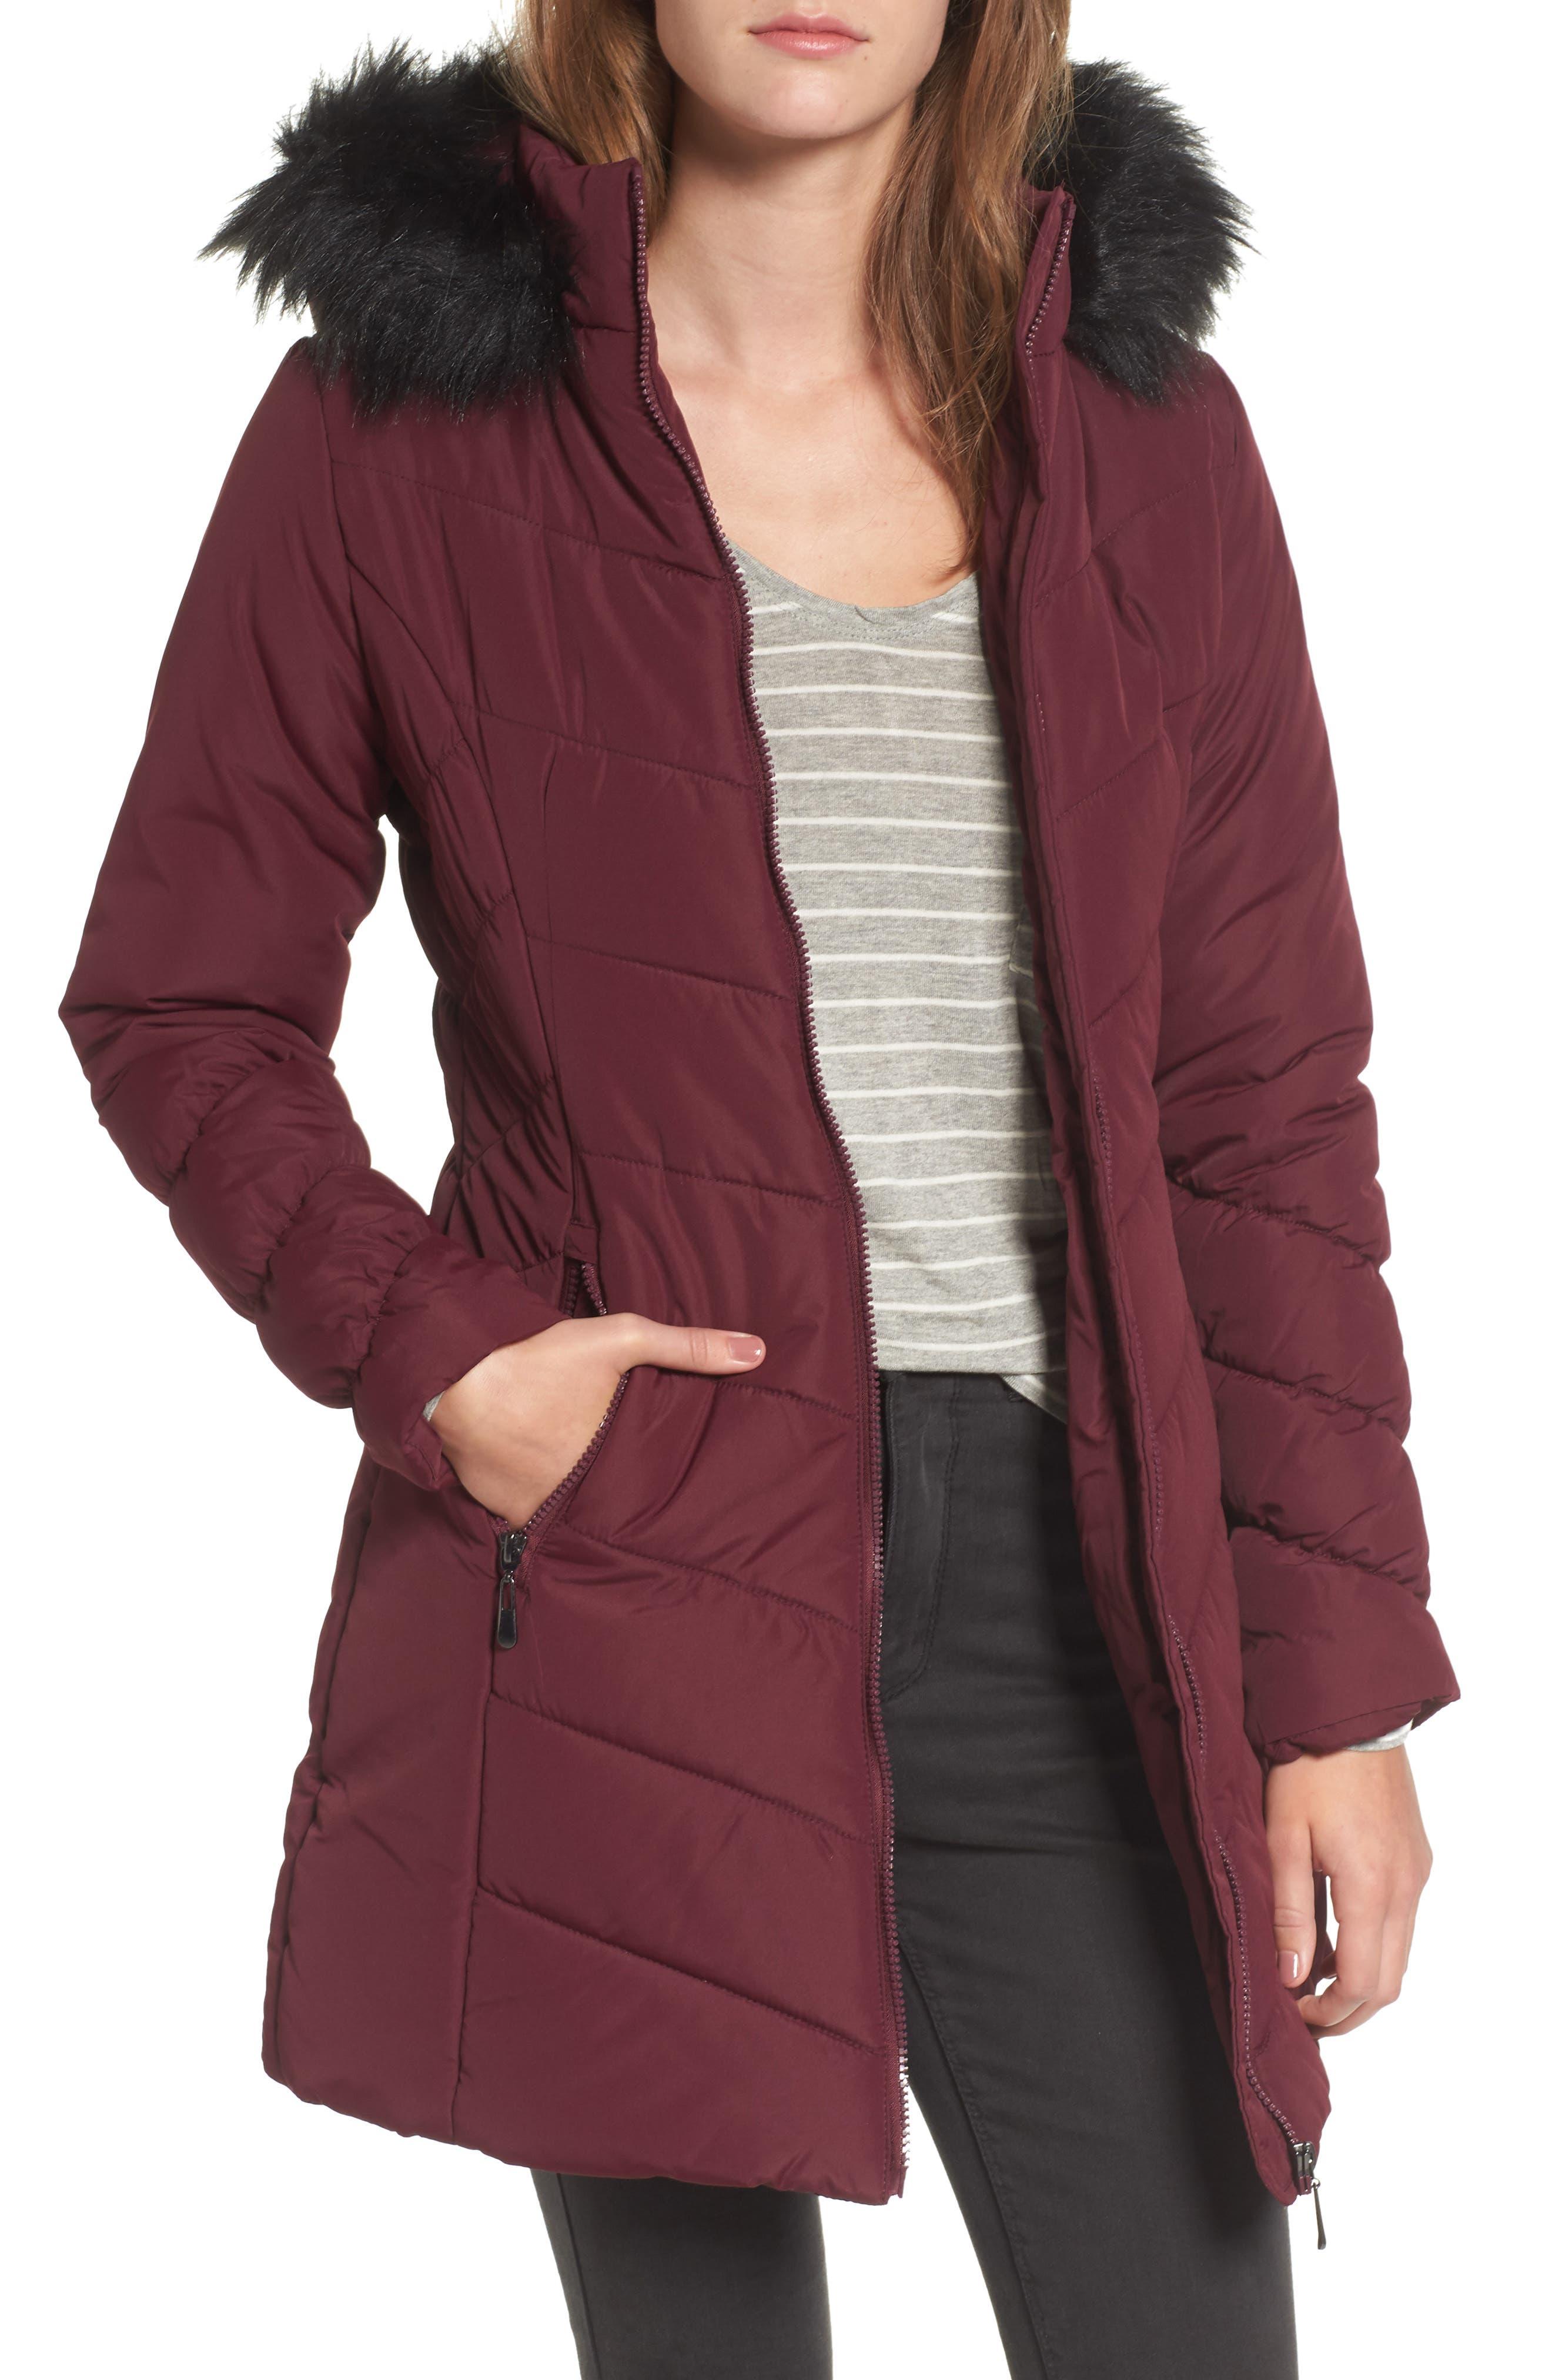 Alternate Image 1 Selected - Maralyn & Me Faux Fur Trim Hooded Puffer Jacket